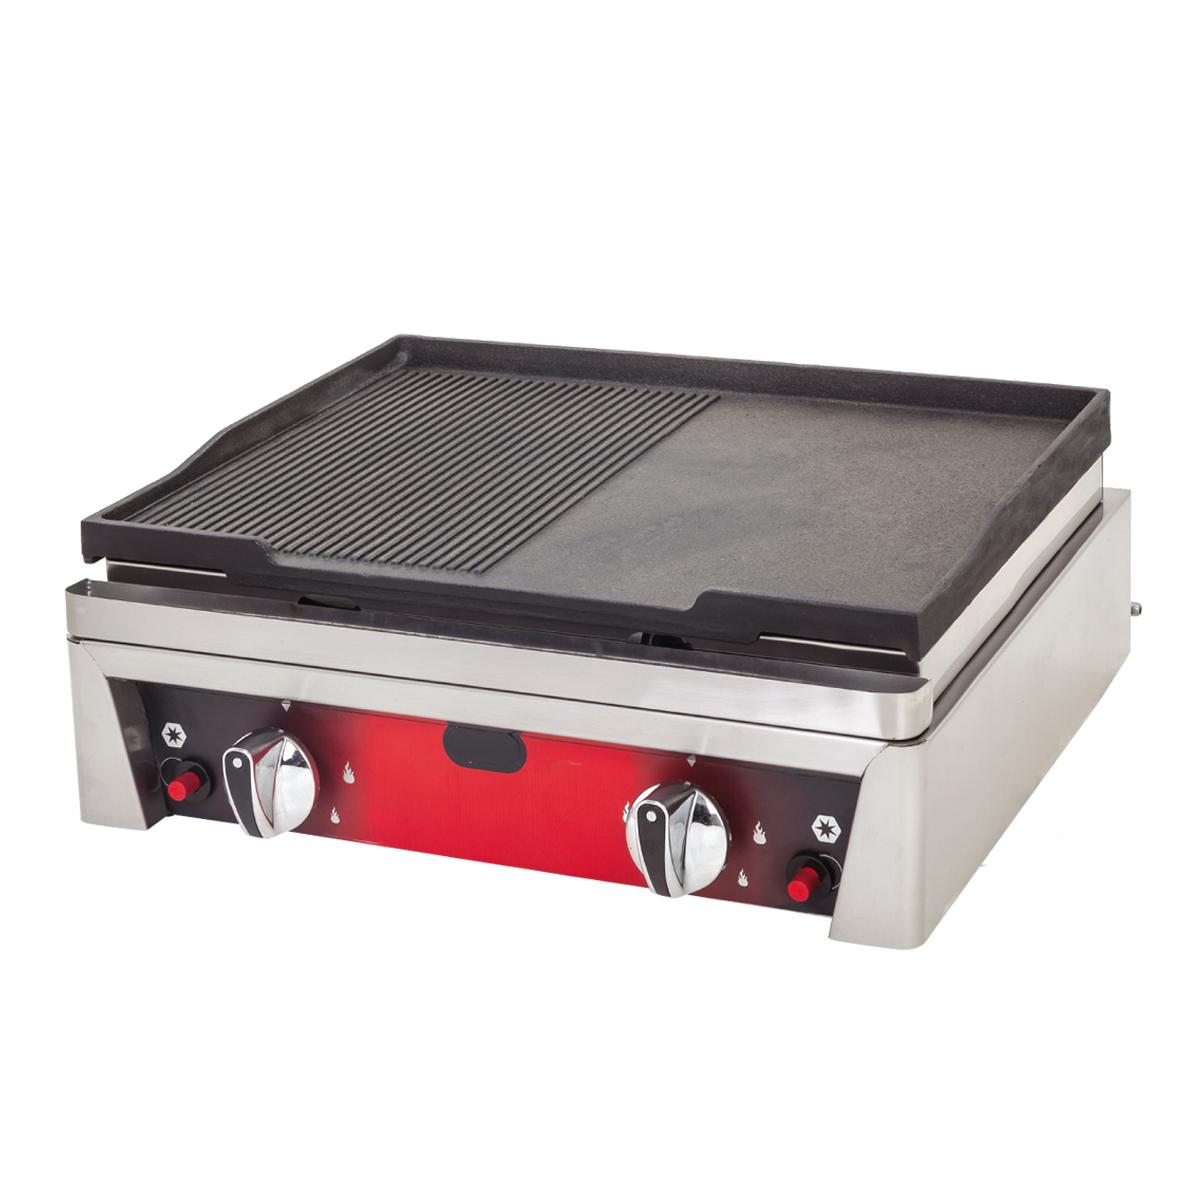 Cast Iron Grill Plus - 50cm - Gas